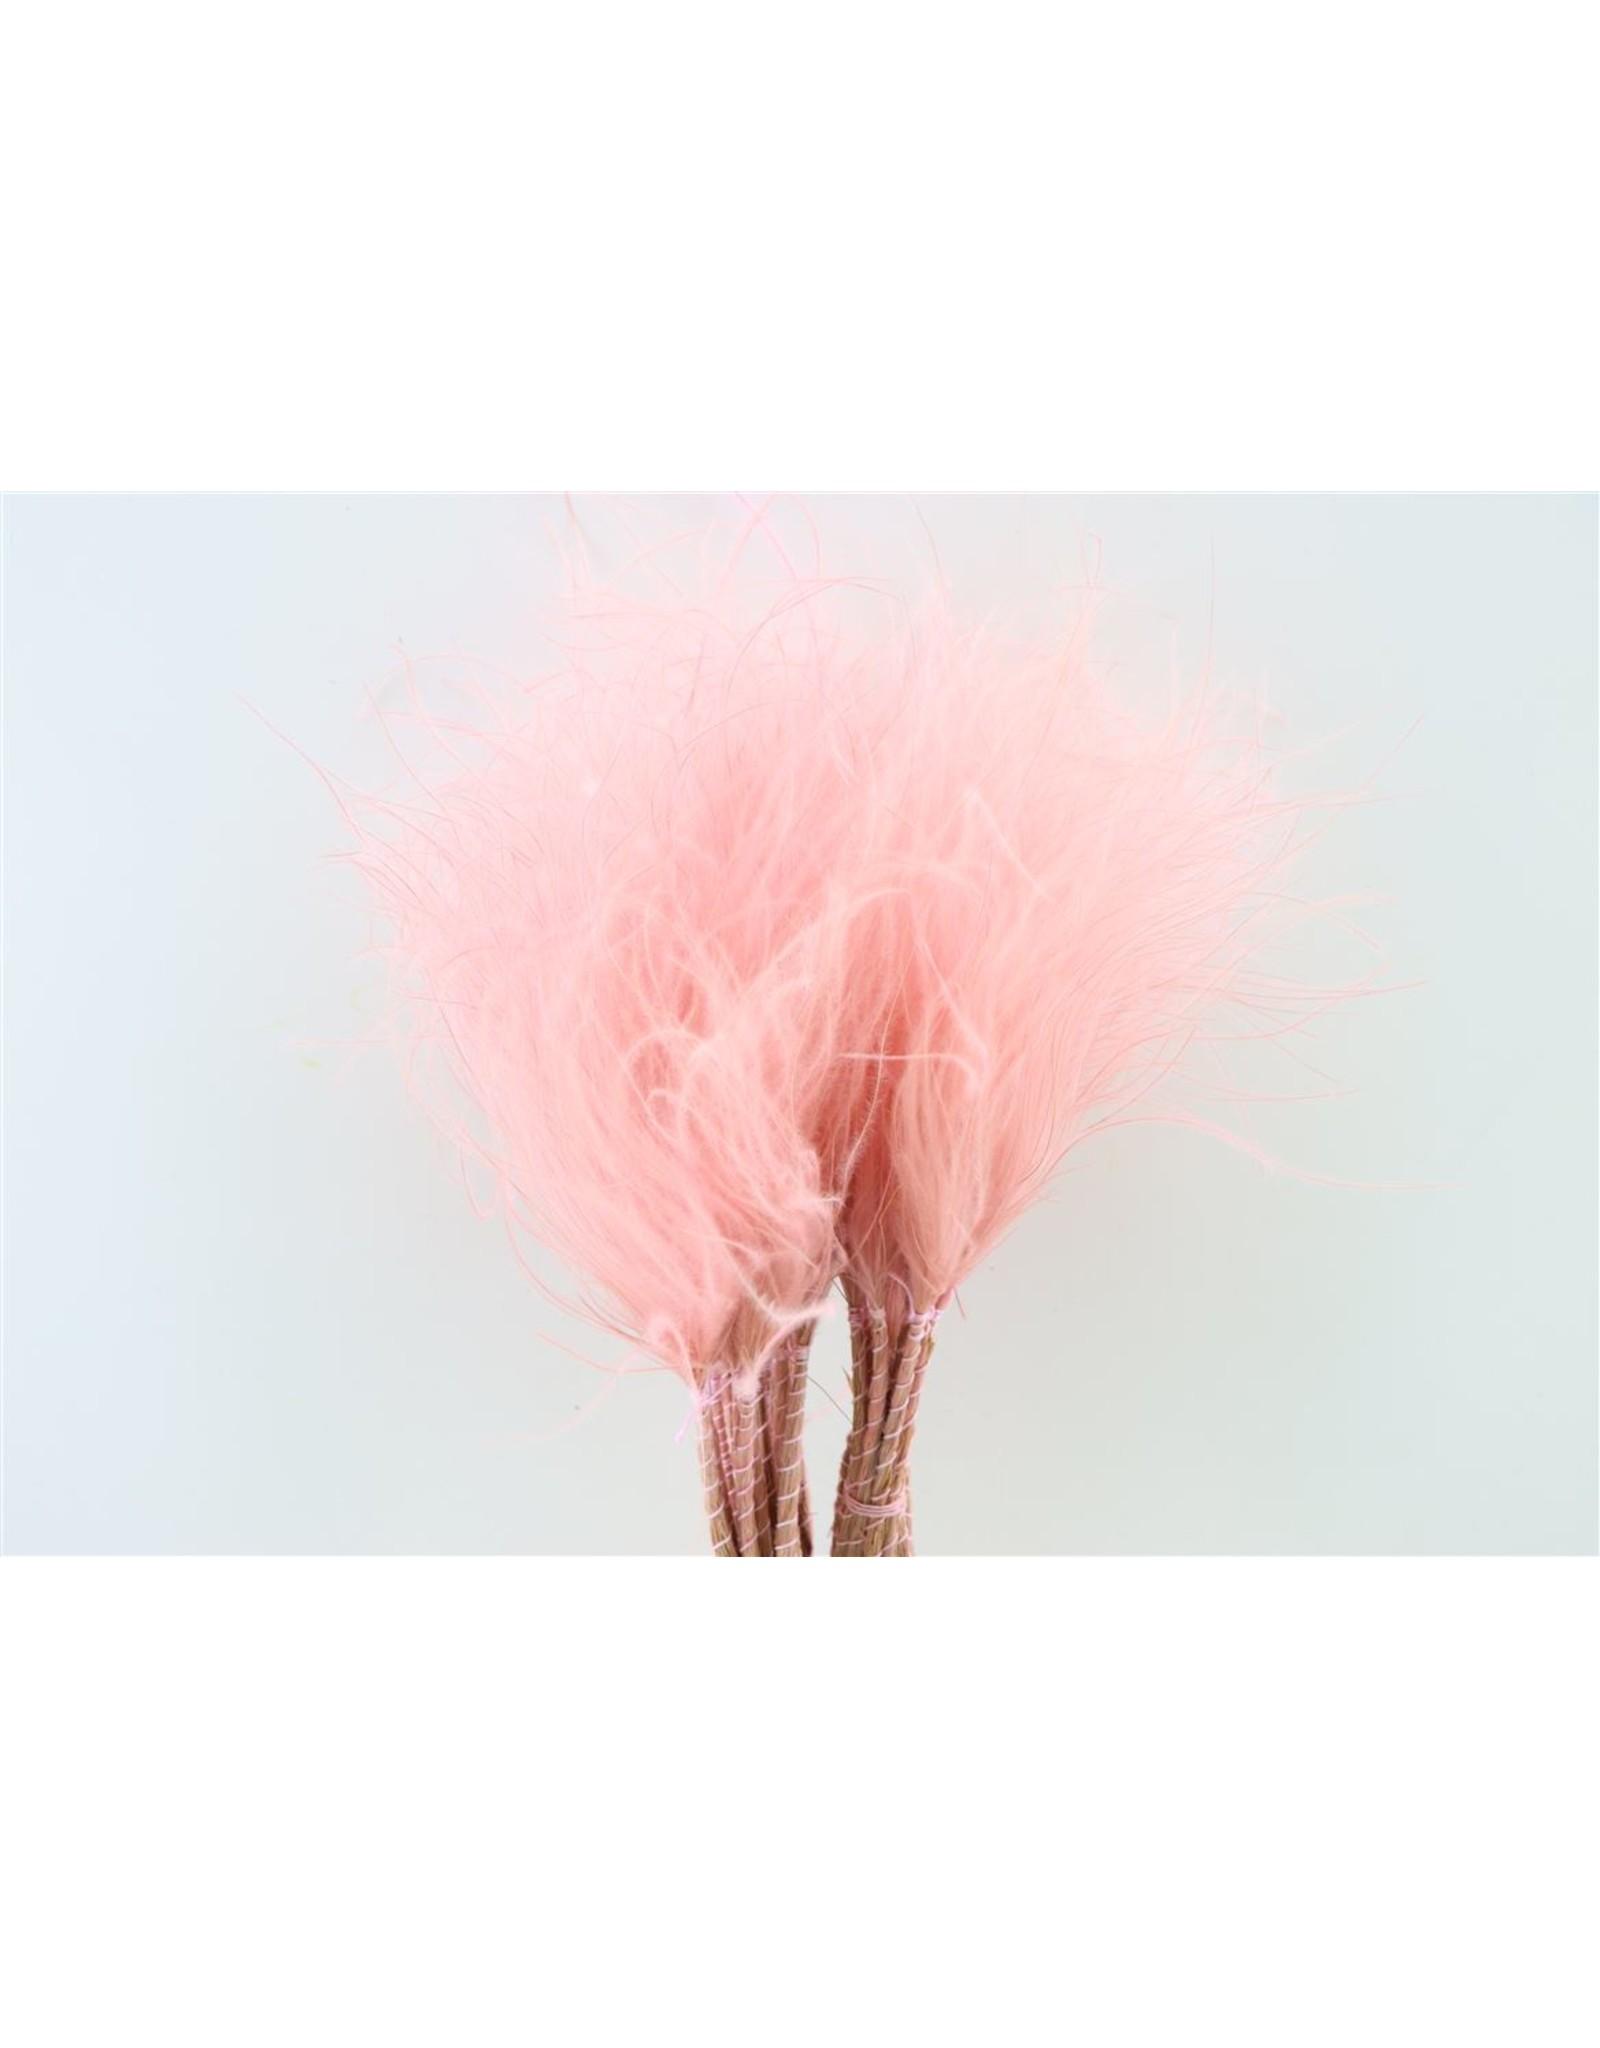 GF Dried Stypha Penata Wild Pastel L. Pink Bunch x 5